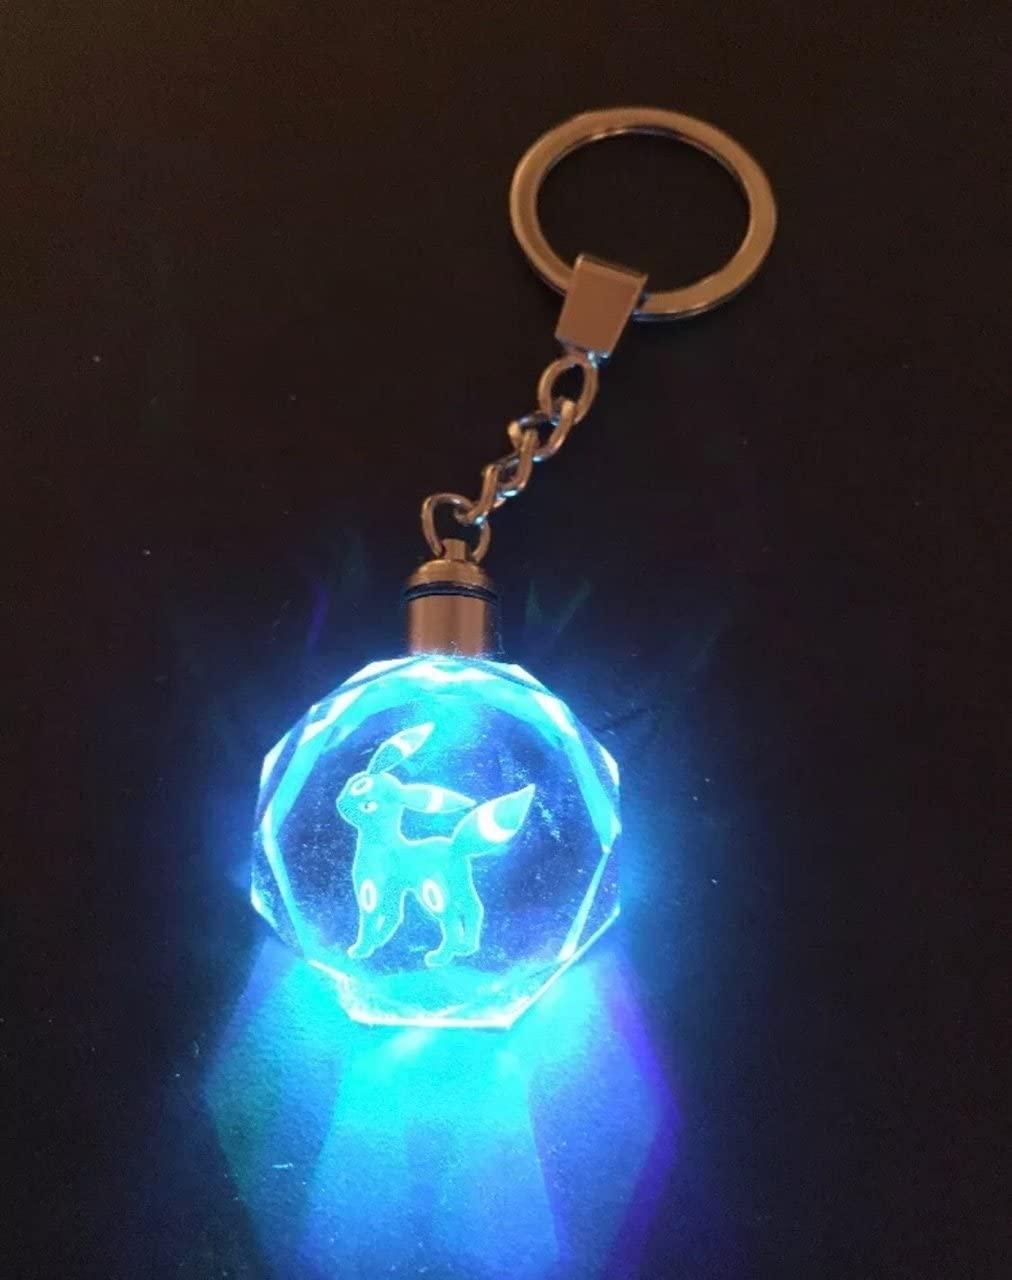 Crystal Pokemon Umbreon LED Keychain K9 Charizard Pikachu Eevee